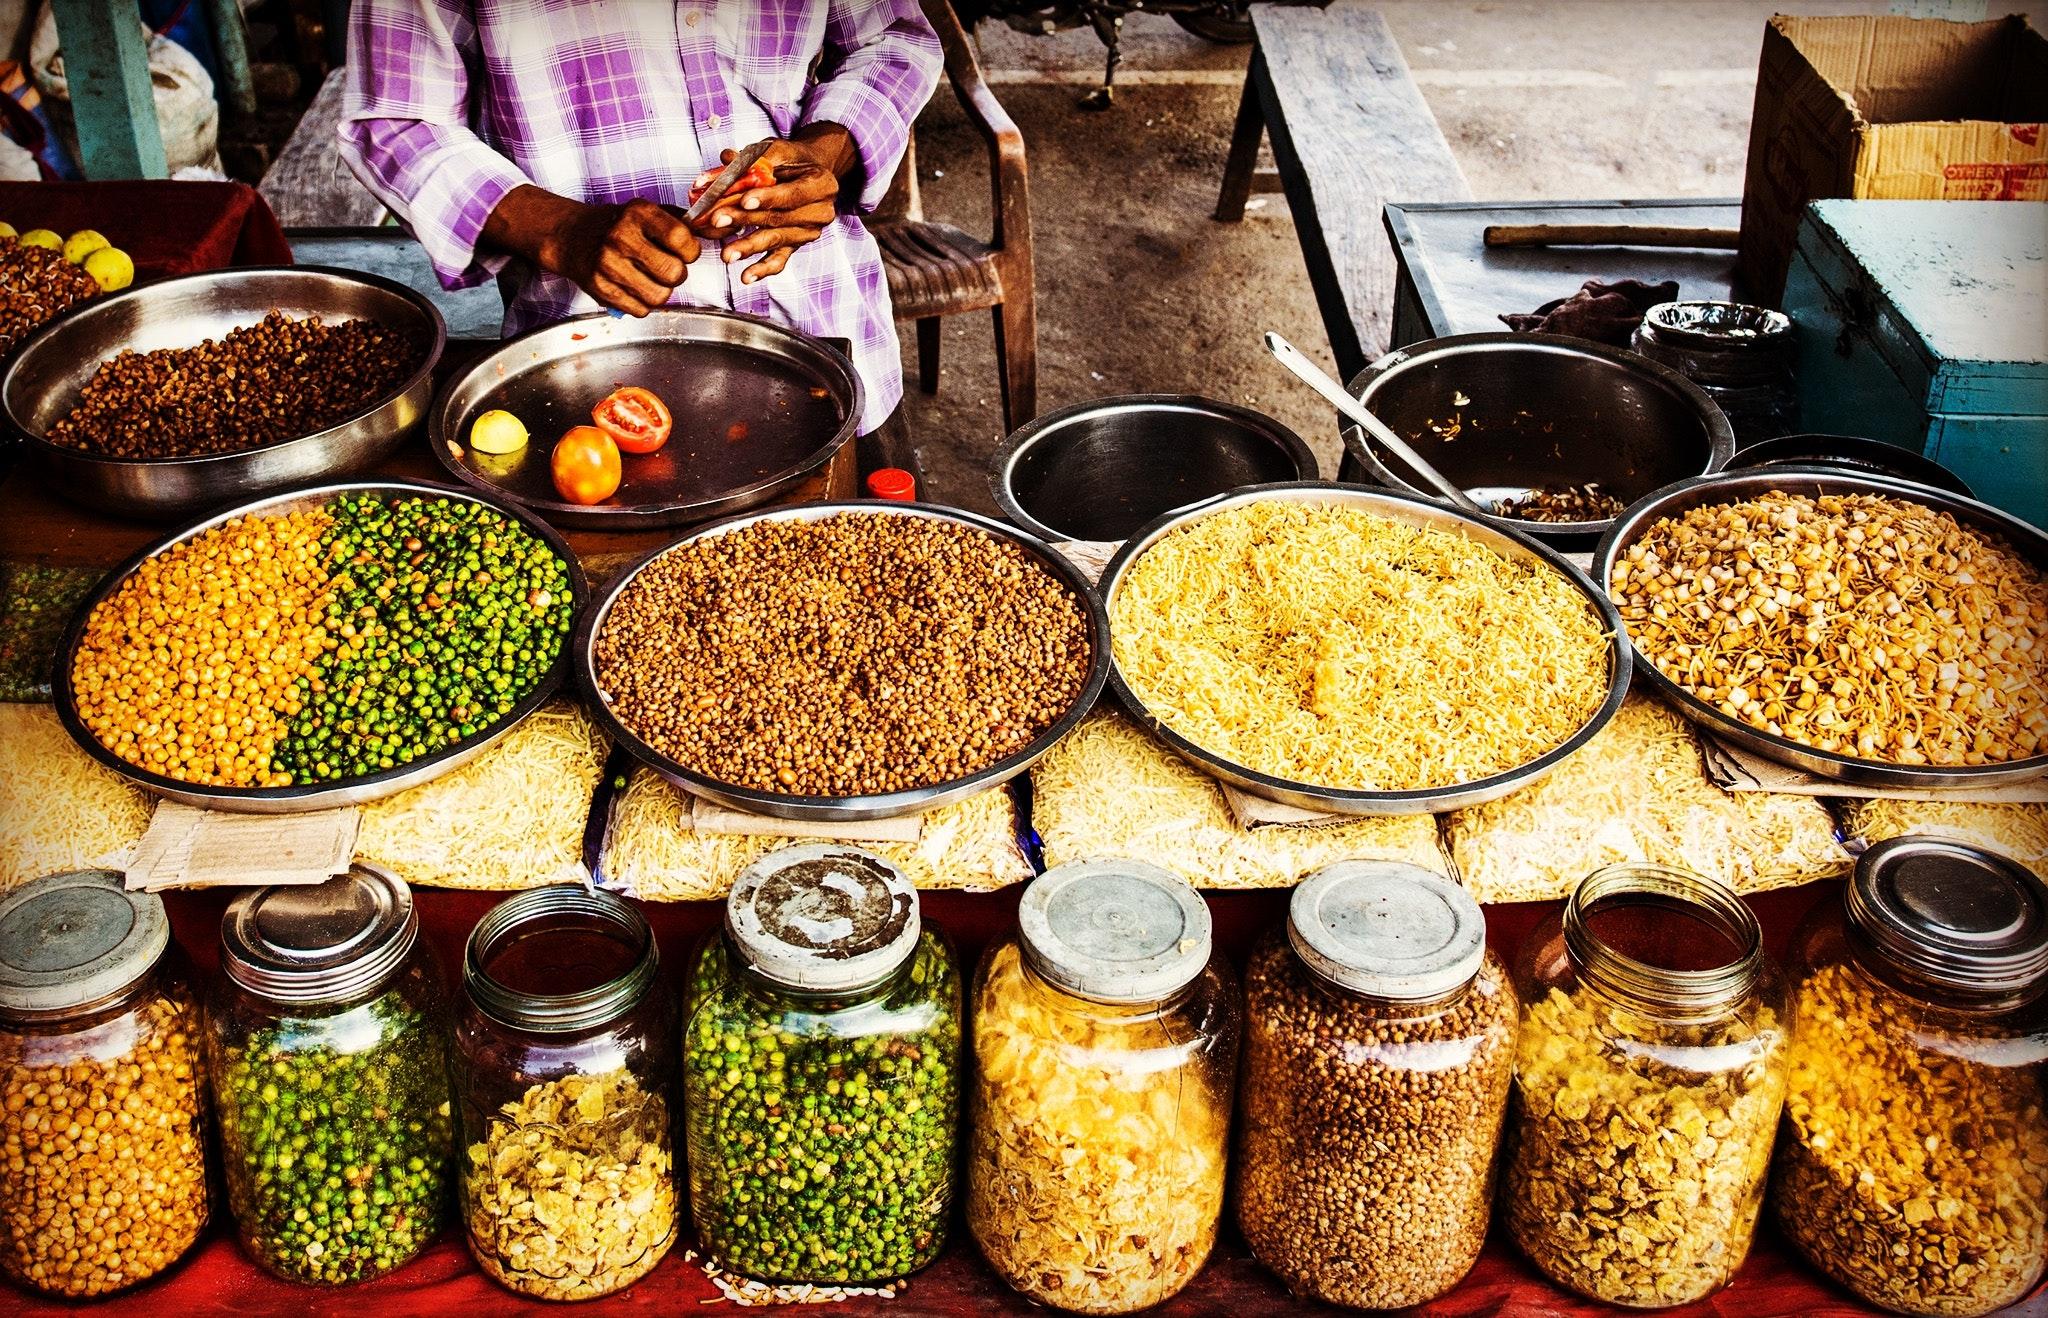 asian-food-beans-cuisine-culture-618491